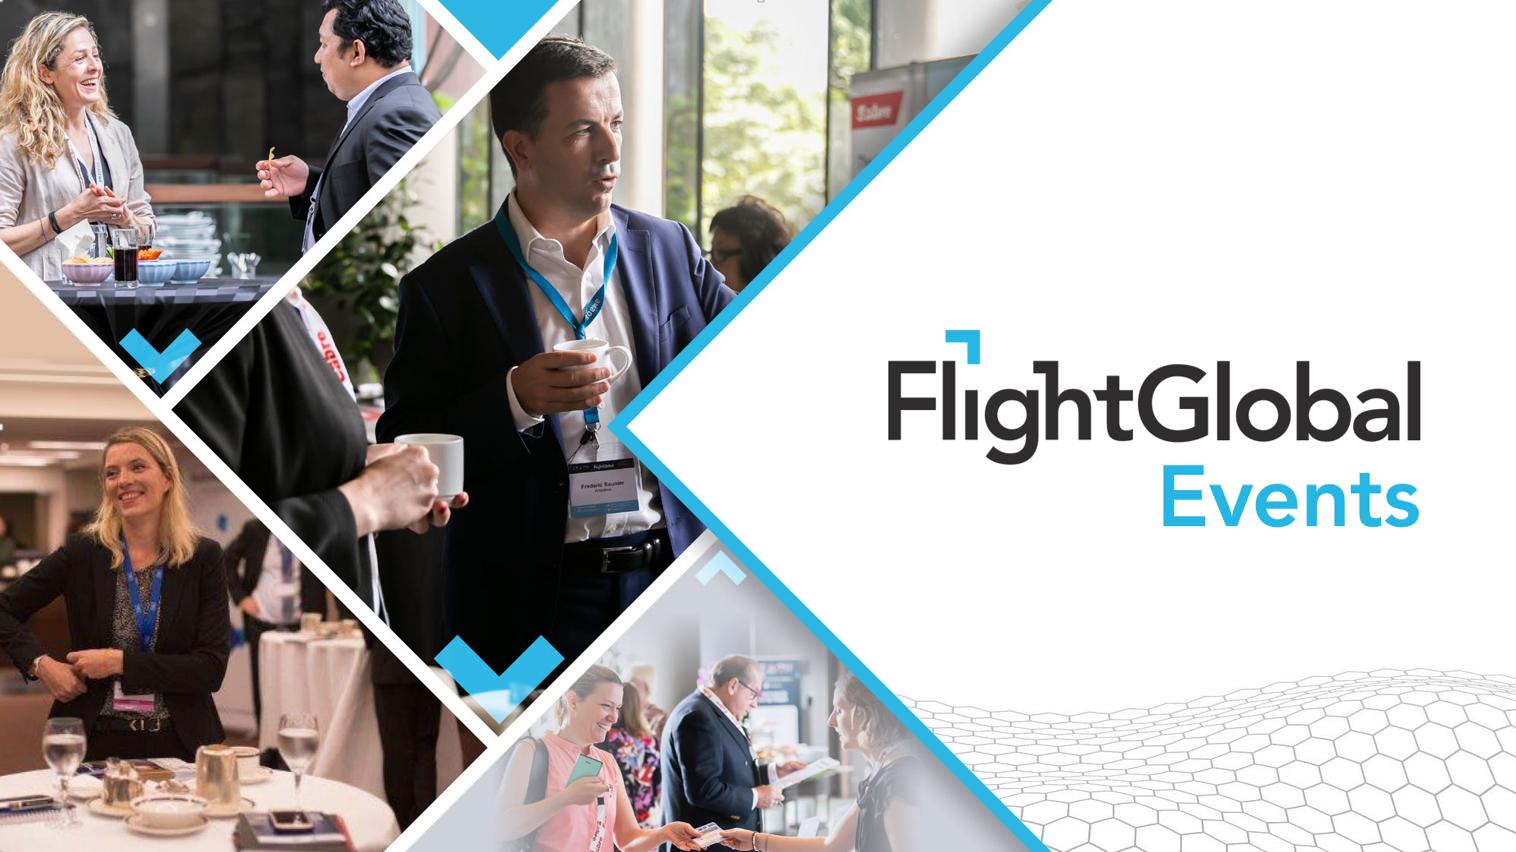 FlightGlobal events image